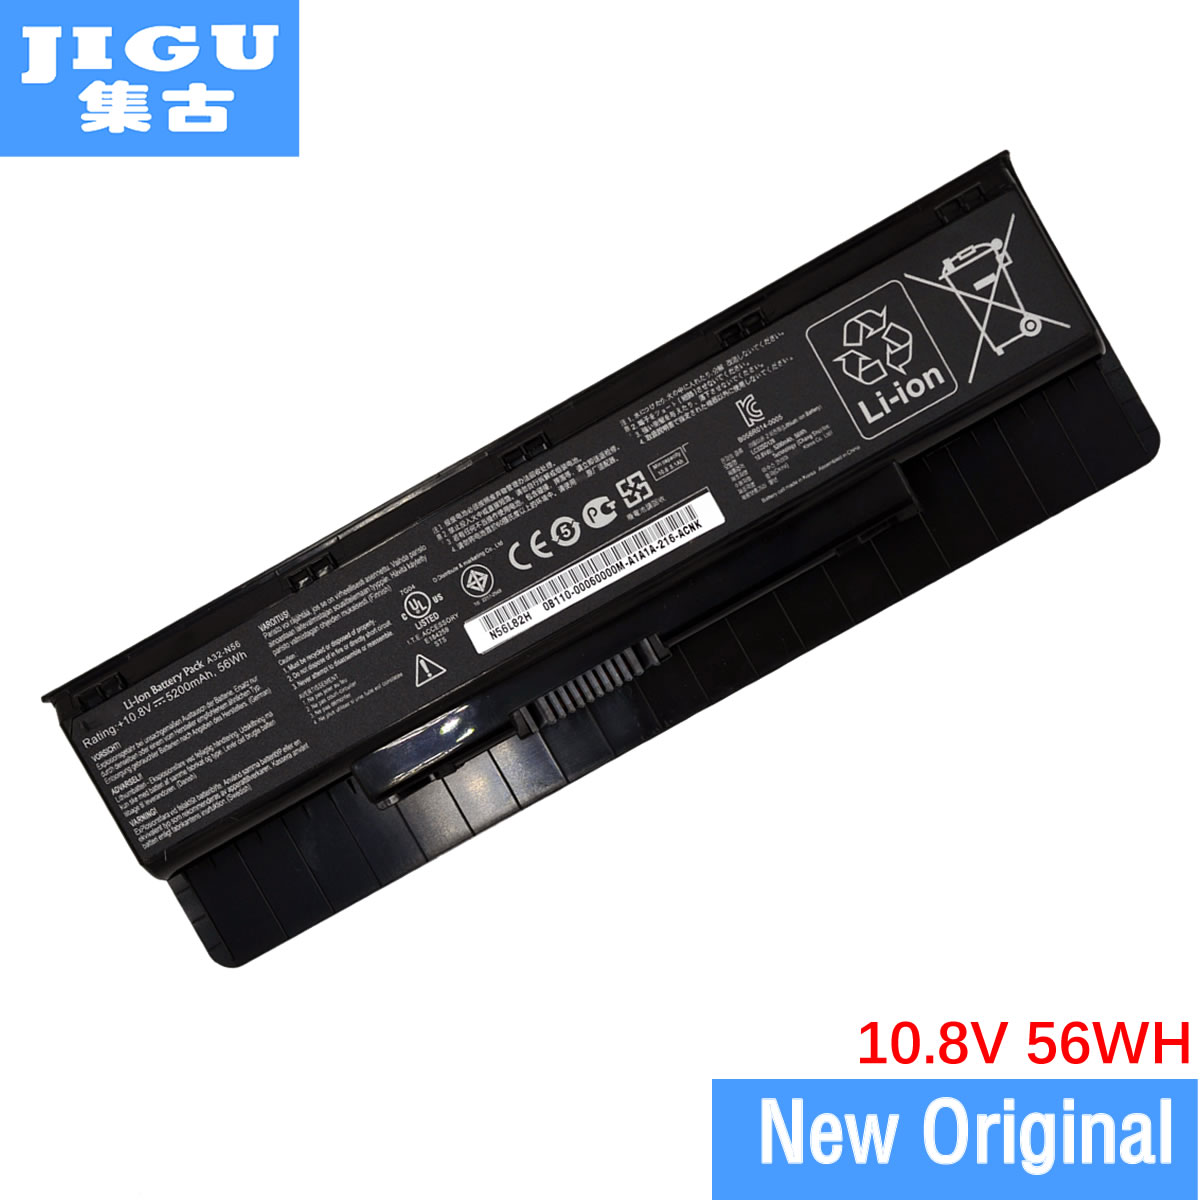 JIGU laptop battery 0B110-00060000 A31-N56 A32-N46 A32-N56 A33-N56 FOR ASUS G56JK G56JR N46 N46VJ N46VM N46VZ N56 N56D N56DP все цены